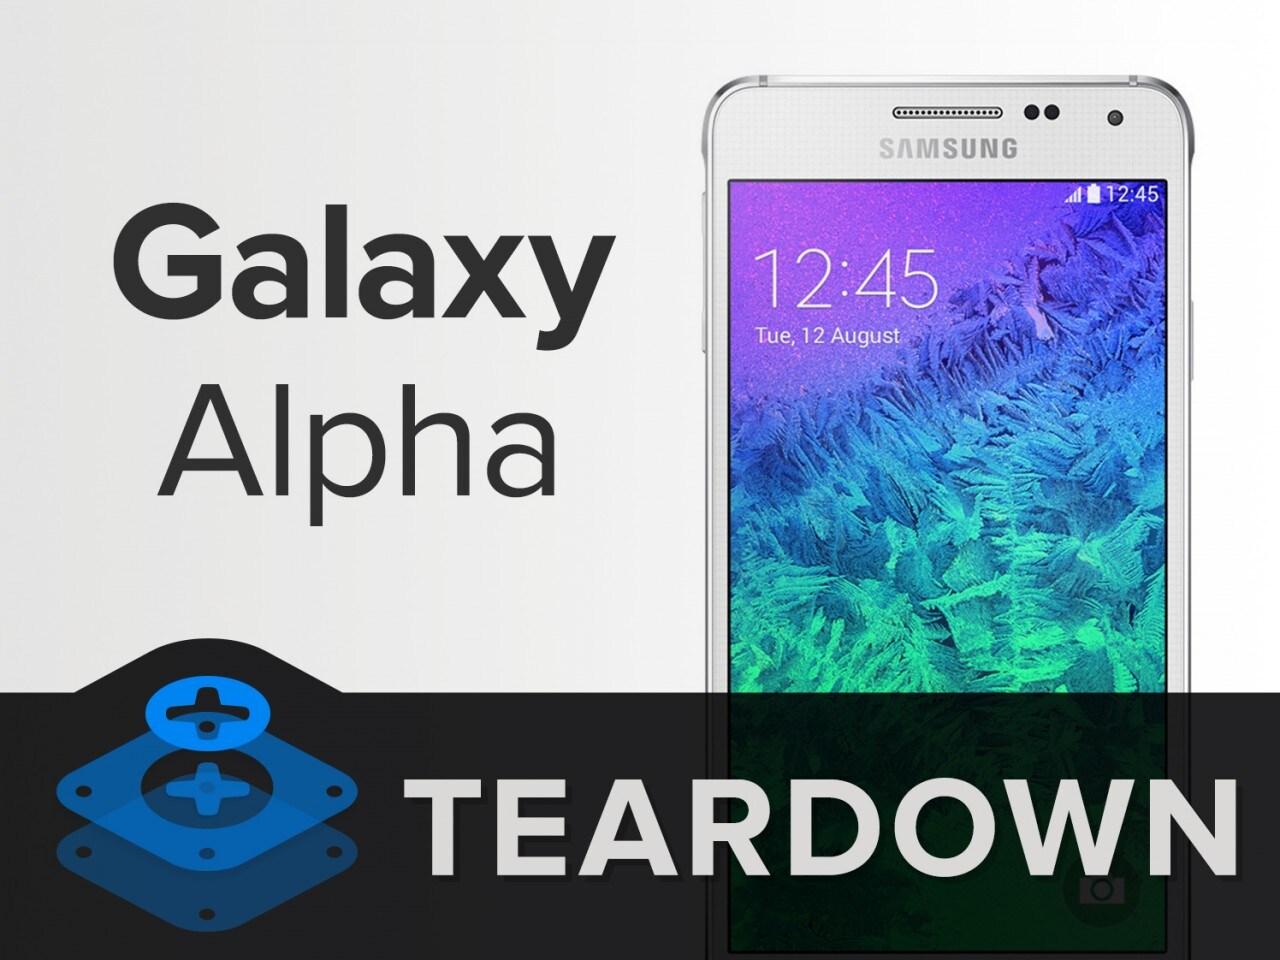 Galaxy Alpha Teardown iFixit